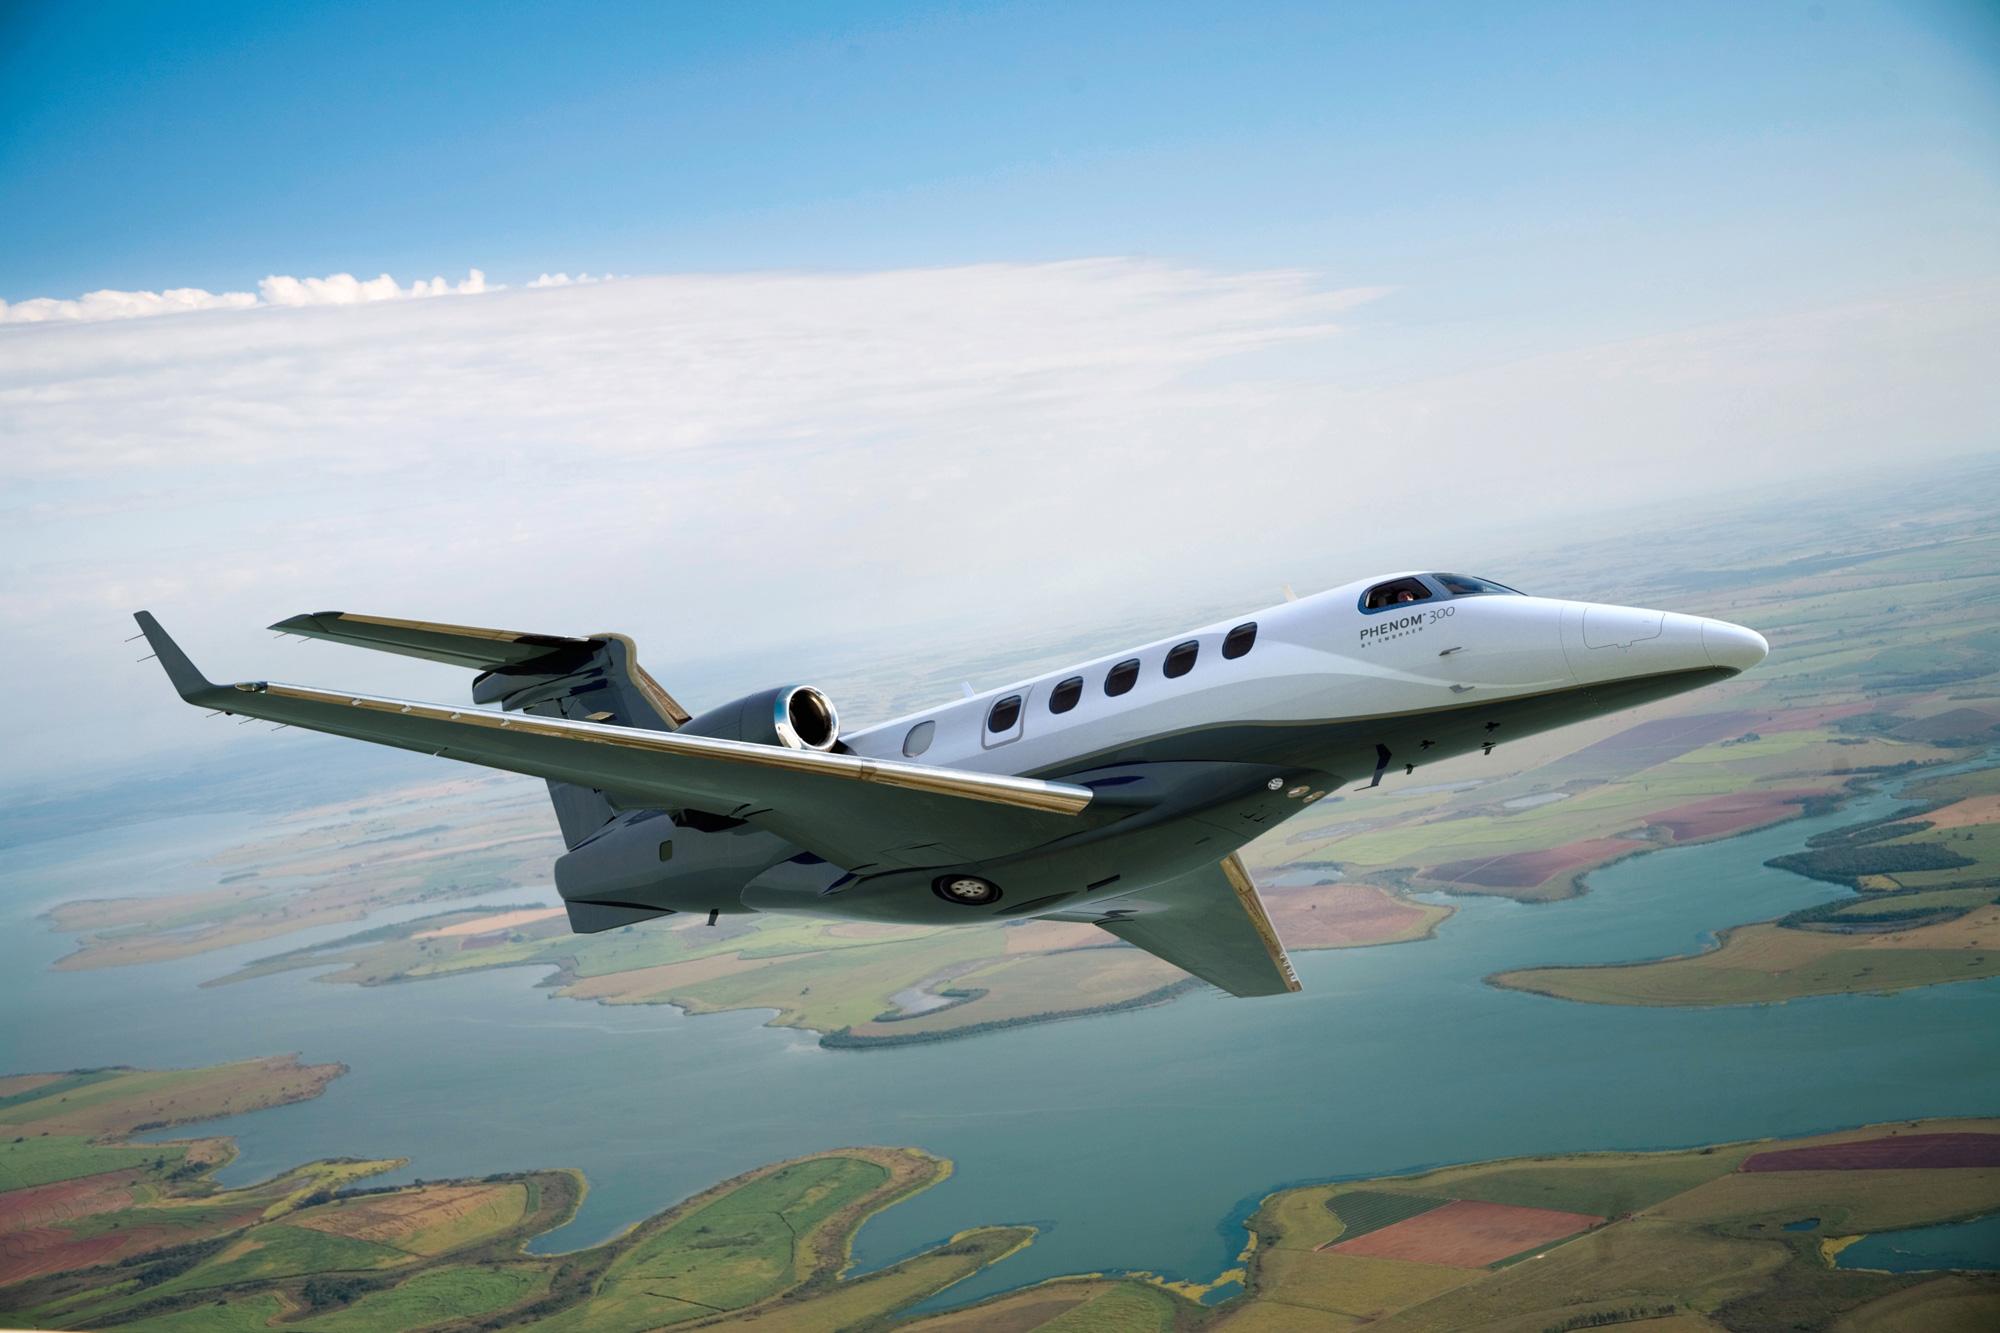 phenom 300 flight 04 - Phenom 300